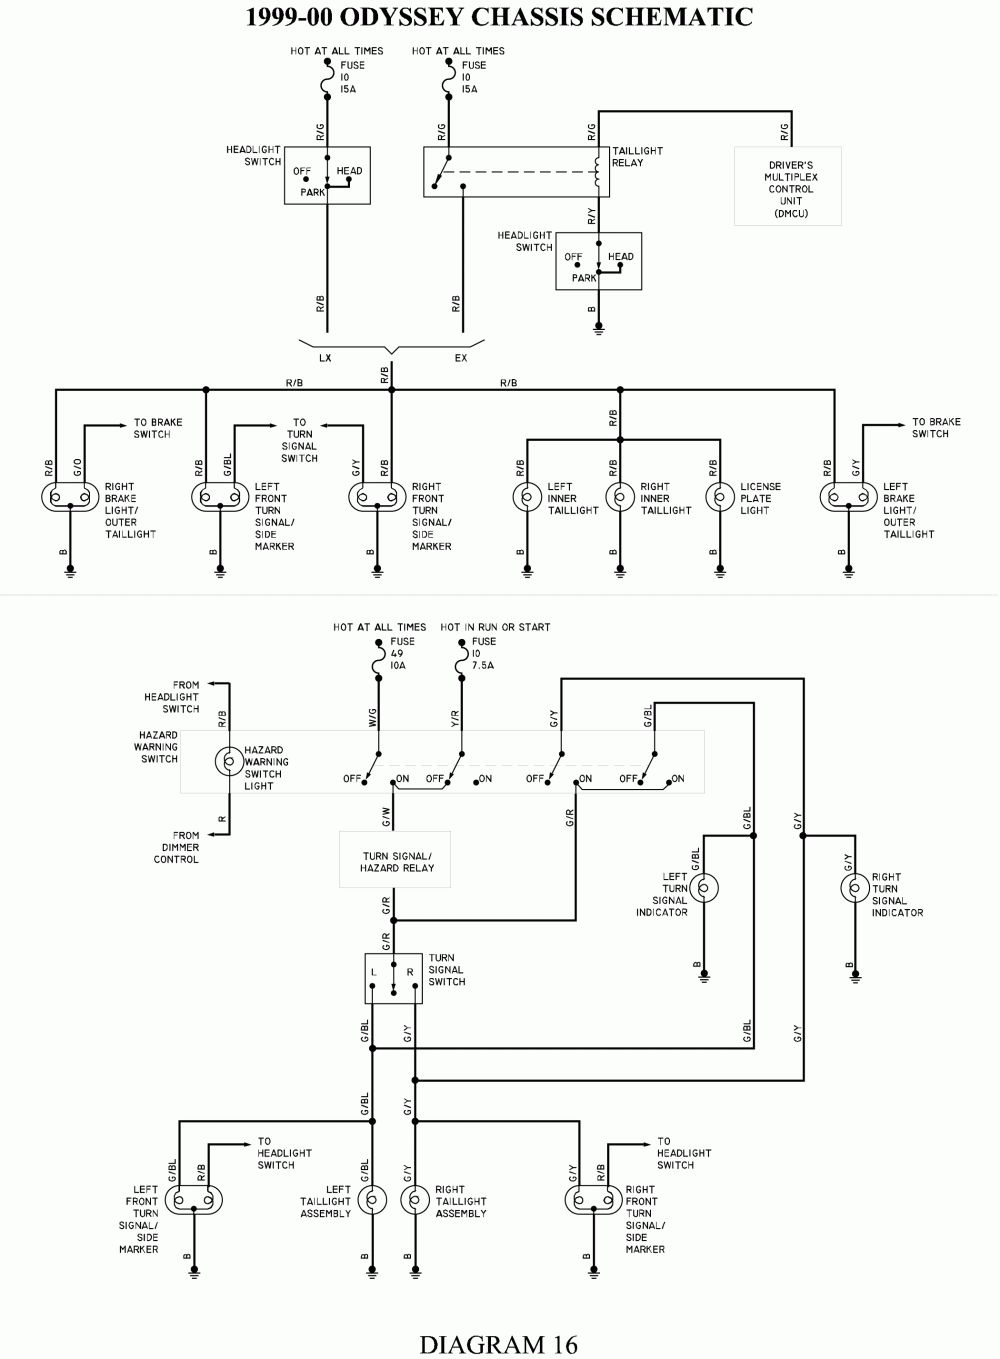 1993 Honda Accord Headlight Wiring Diagram Homelite 360 Chainsaw Parts 2003 Turn Signal All Data Library Pilot